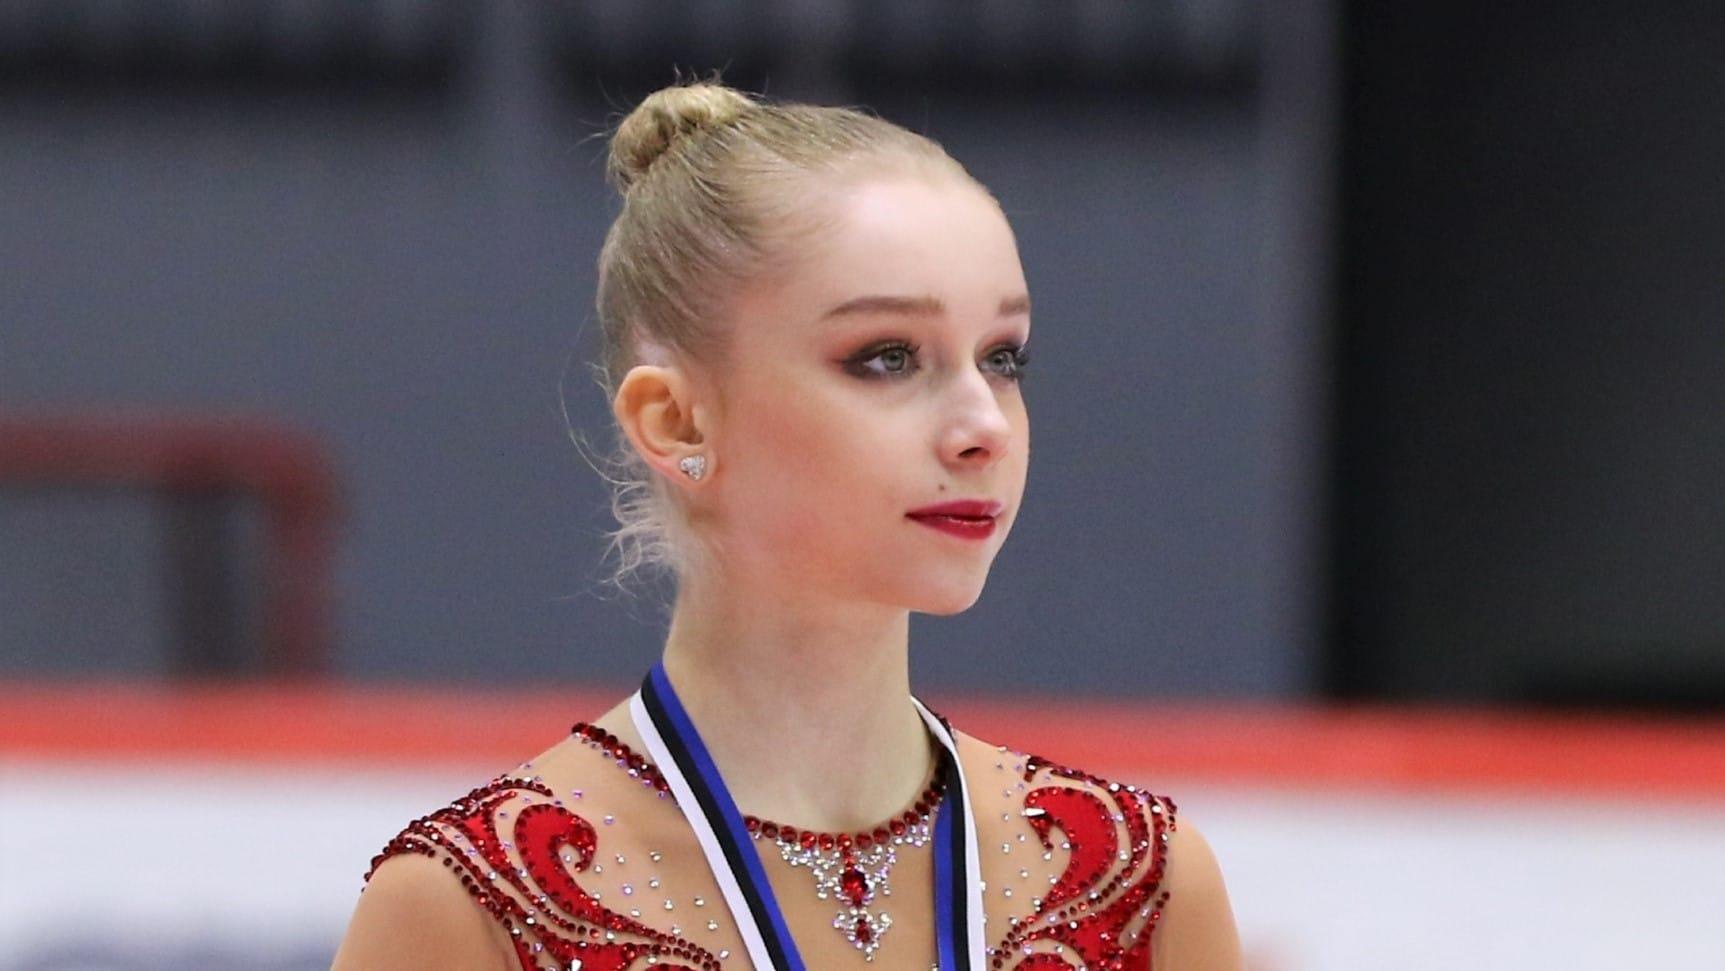 Taitoluistelija Viveca Lindfors